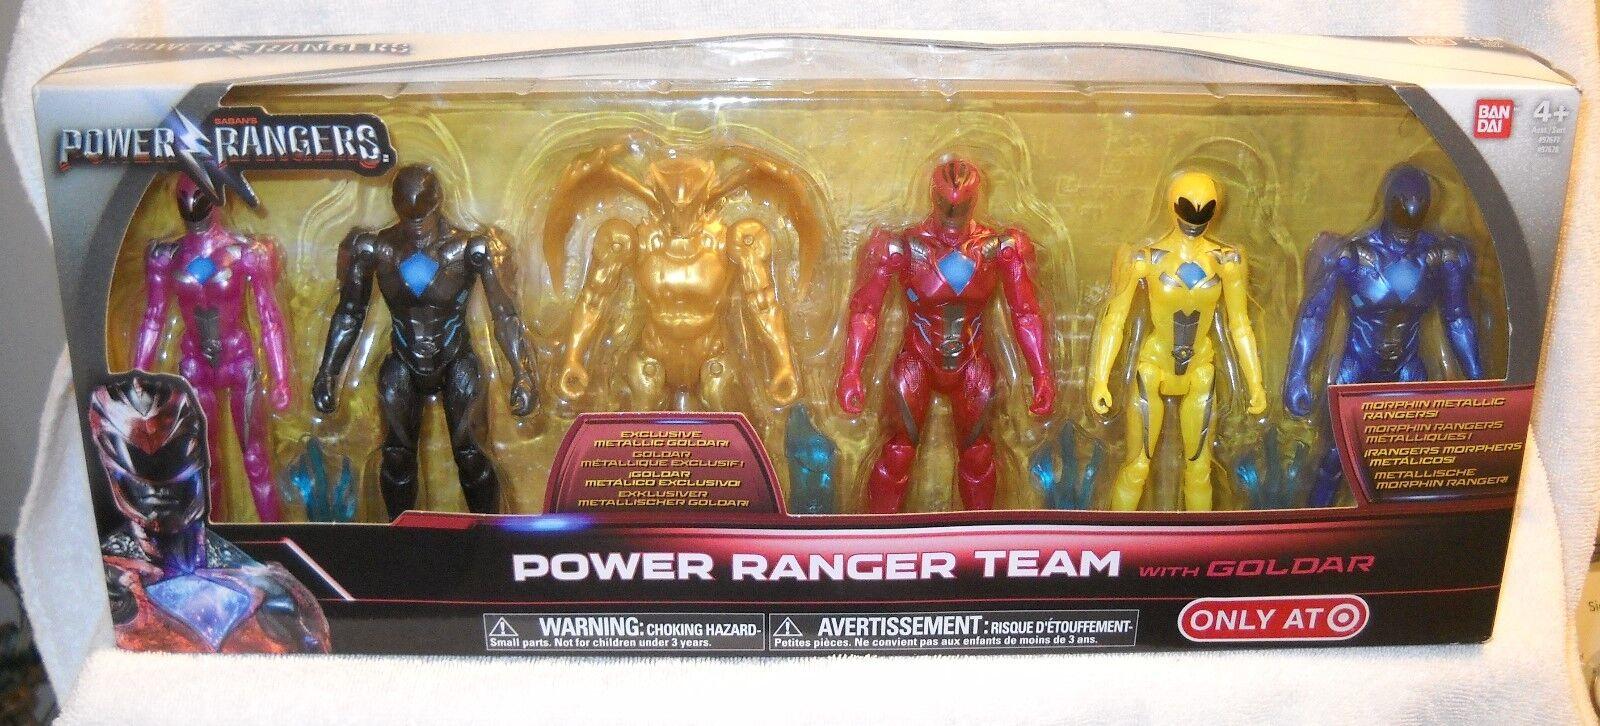 9475 NRFB Ban Dai Target Power Rangers Team with Goldar Boxed Set